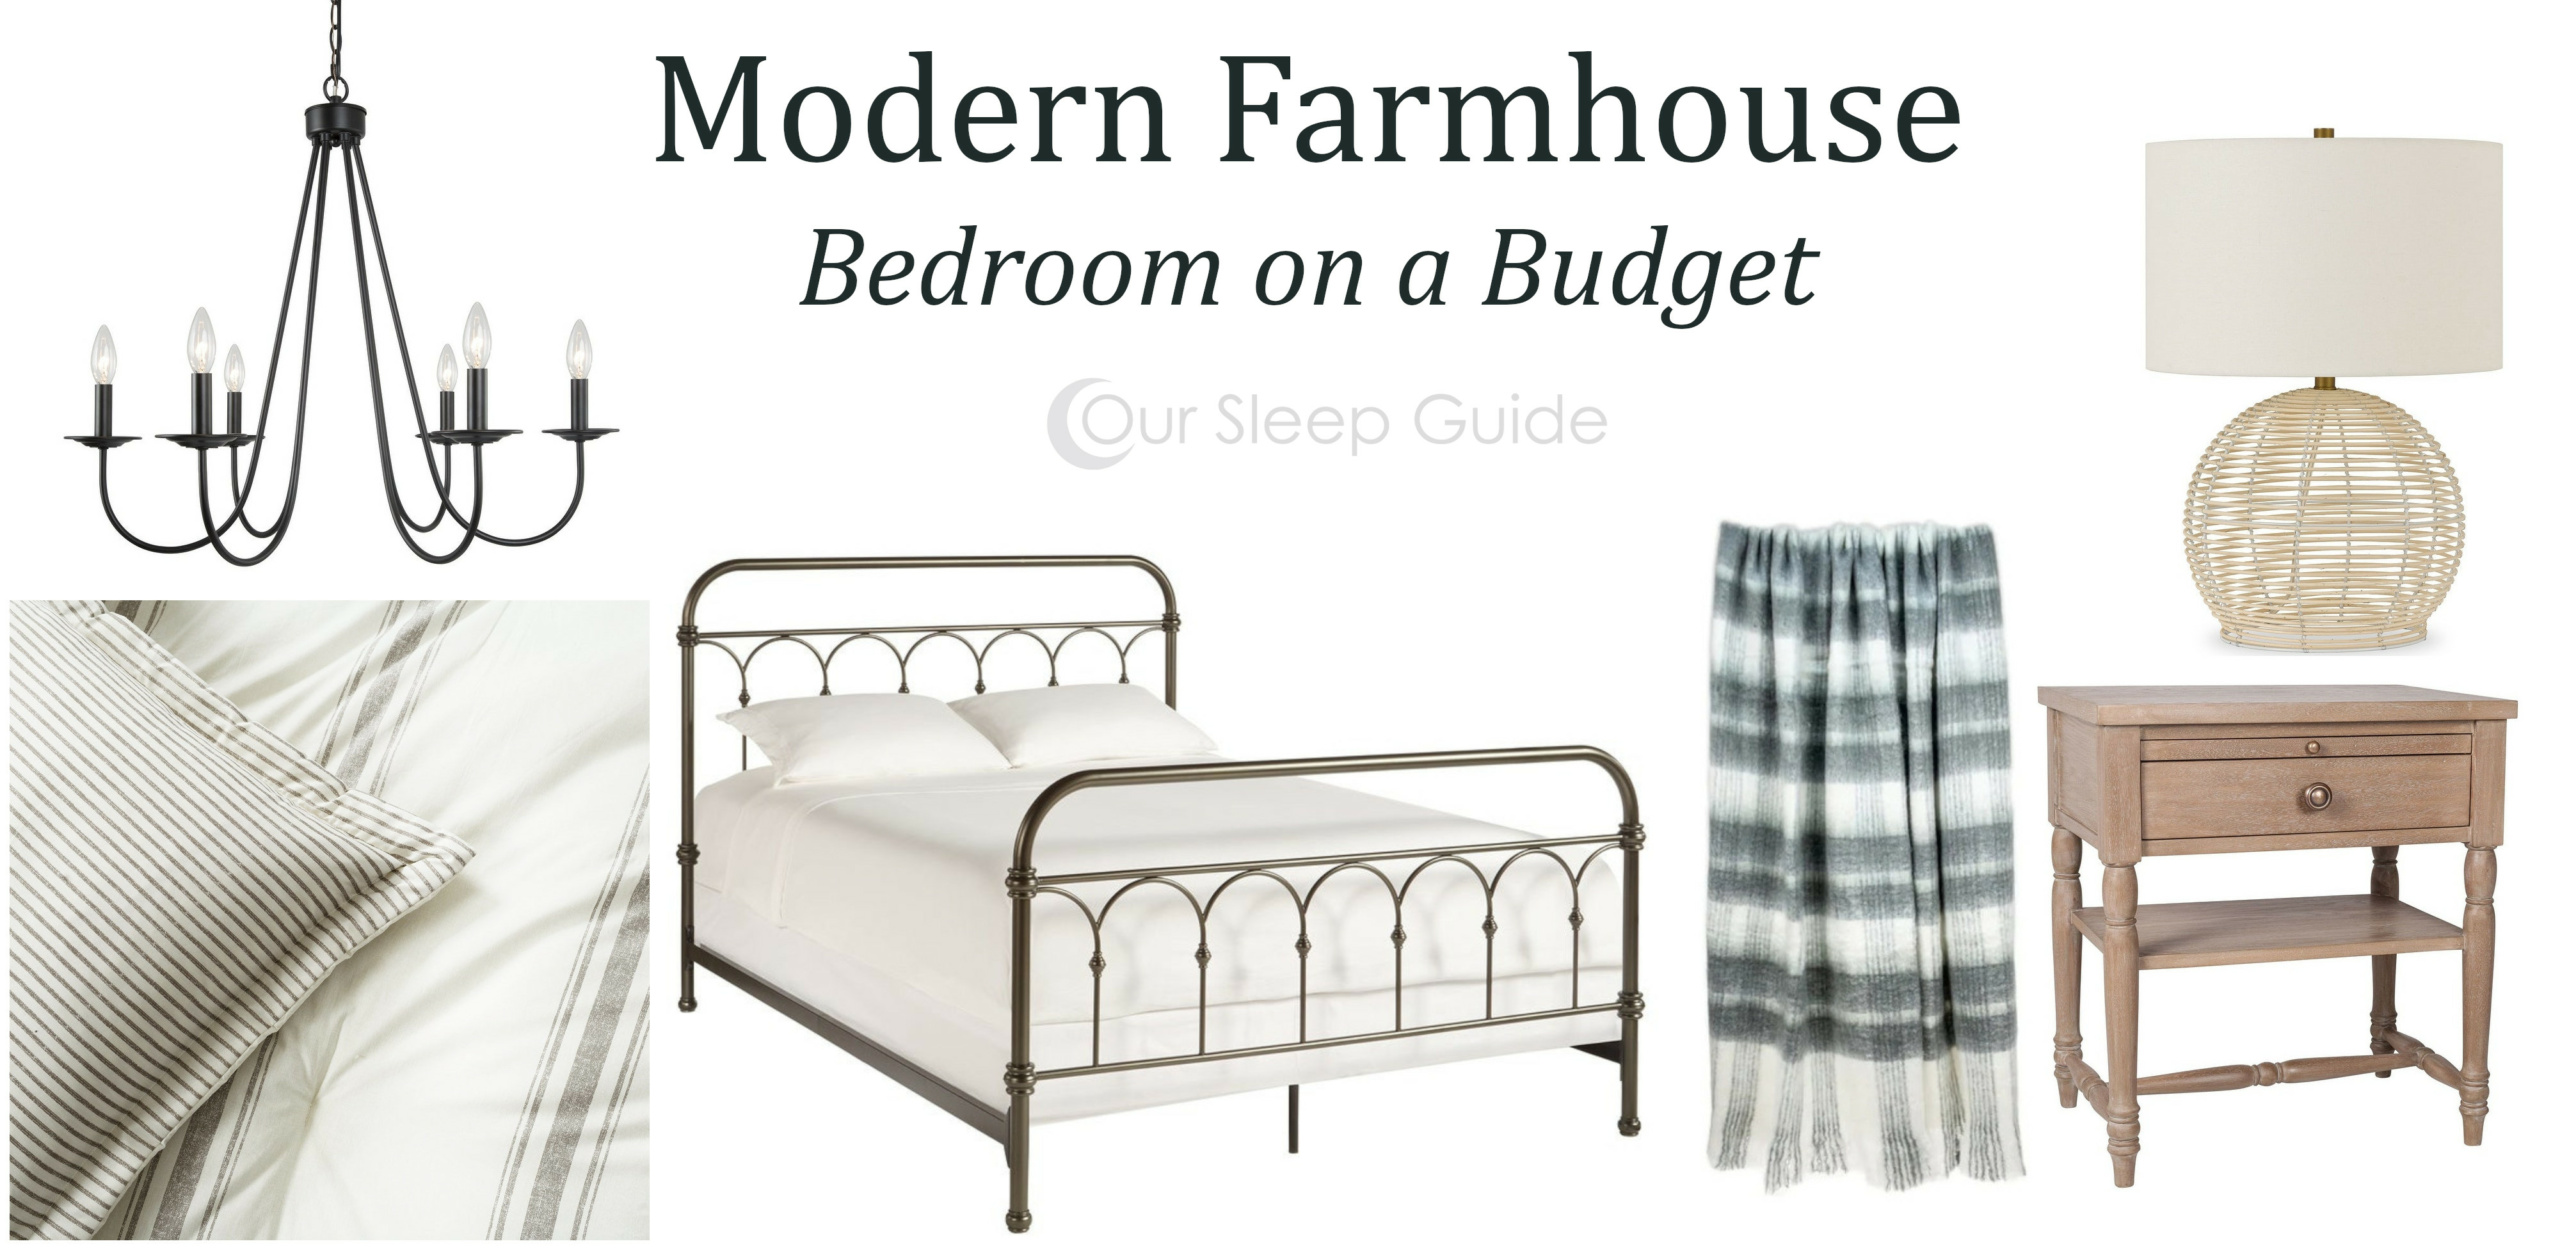 modern farmhouse bedroom design on a budget